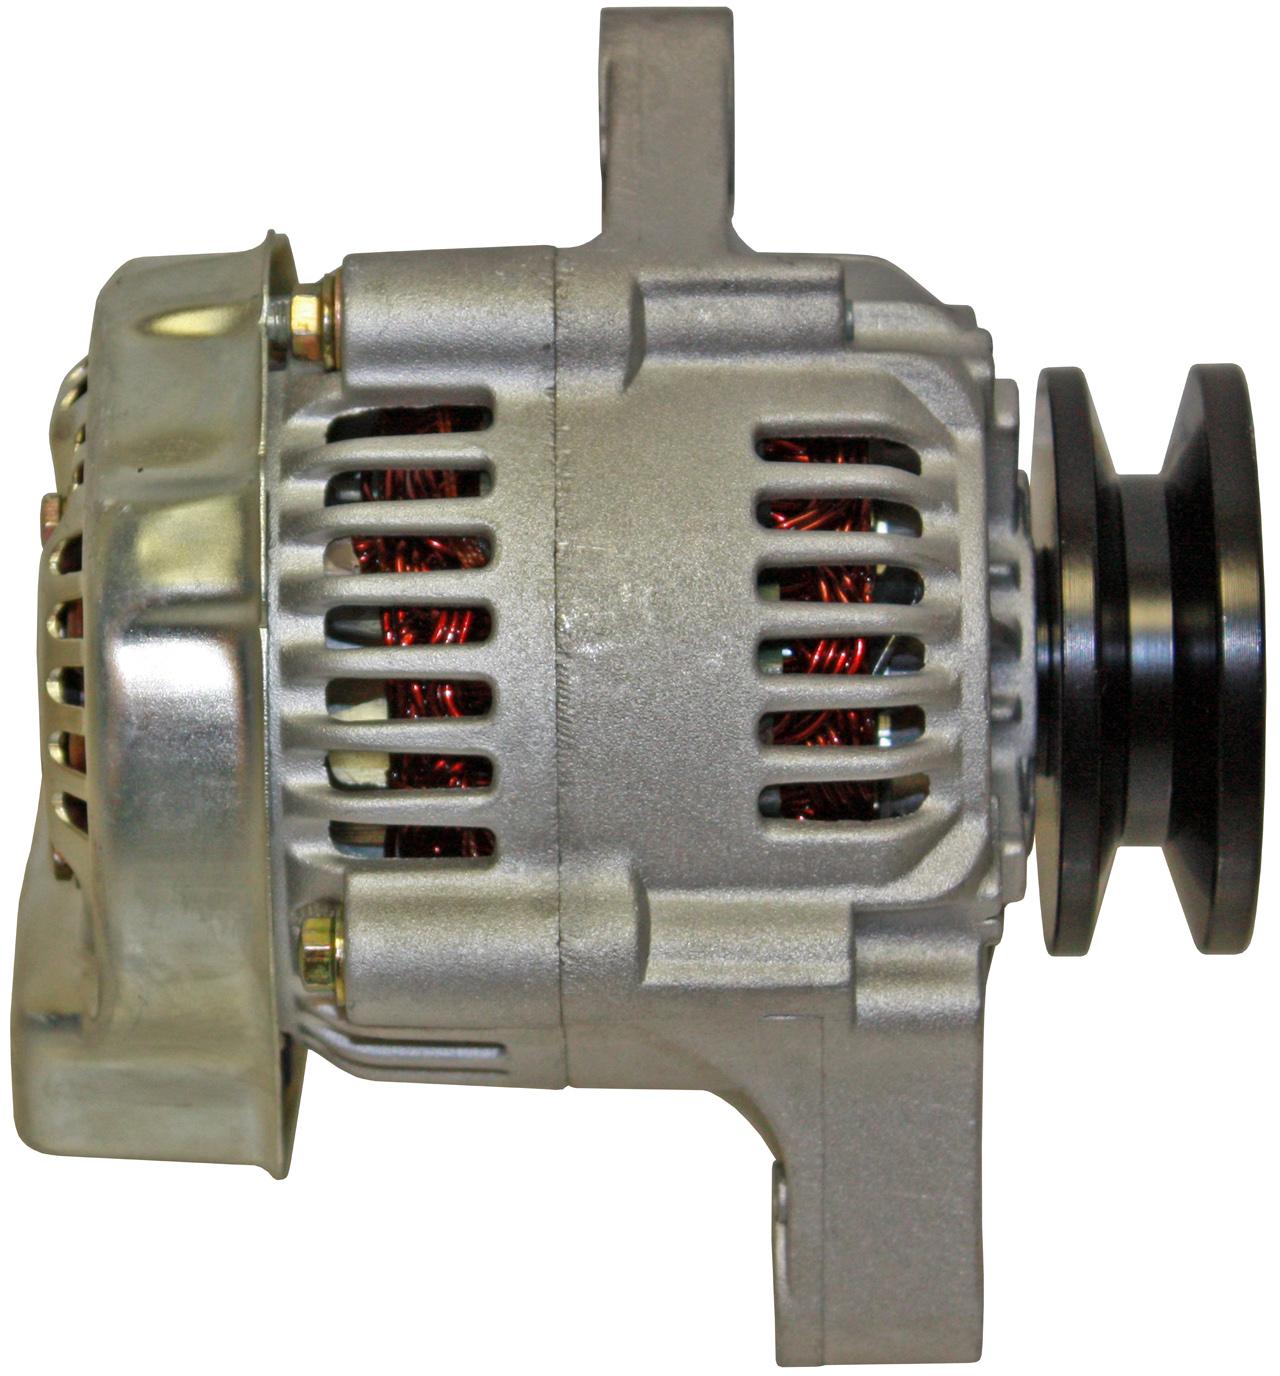 B 1410 F 1900 Kubota Lichtmaschine F 2880 F 2560 12V//45A F 2400 B 1610